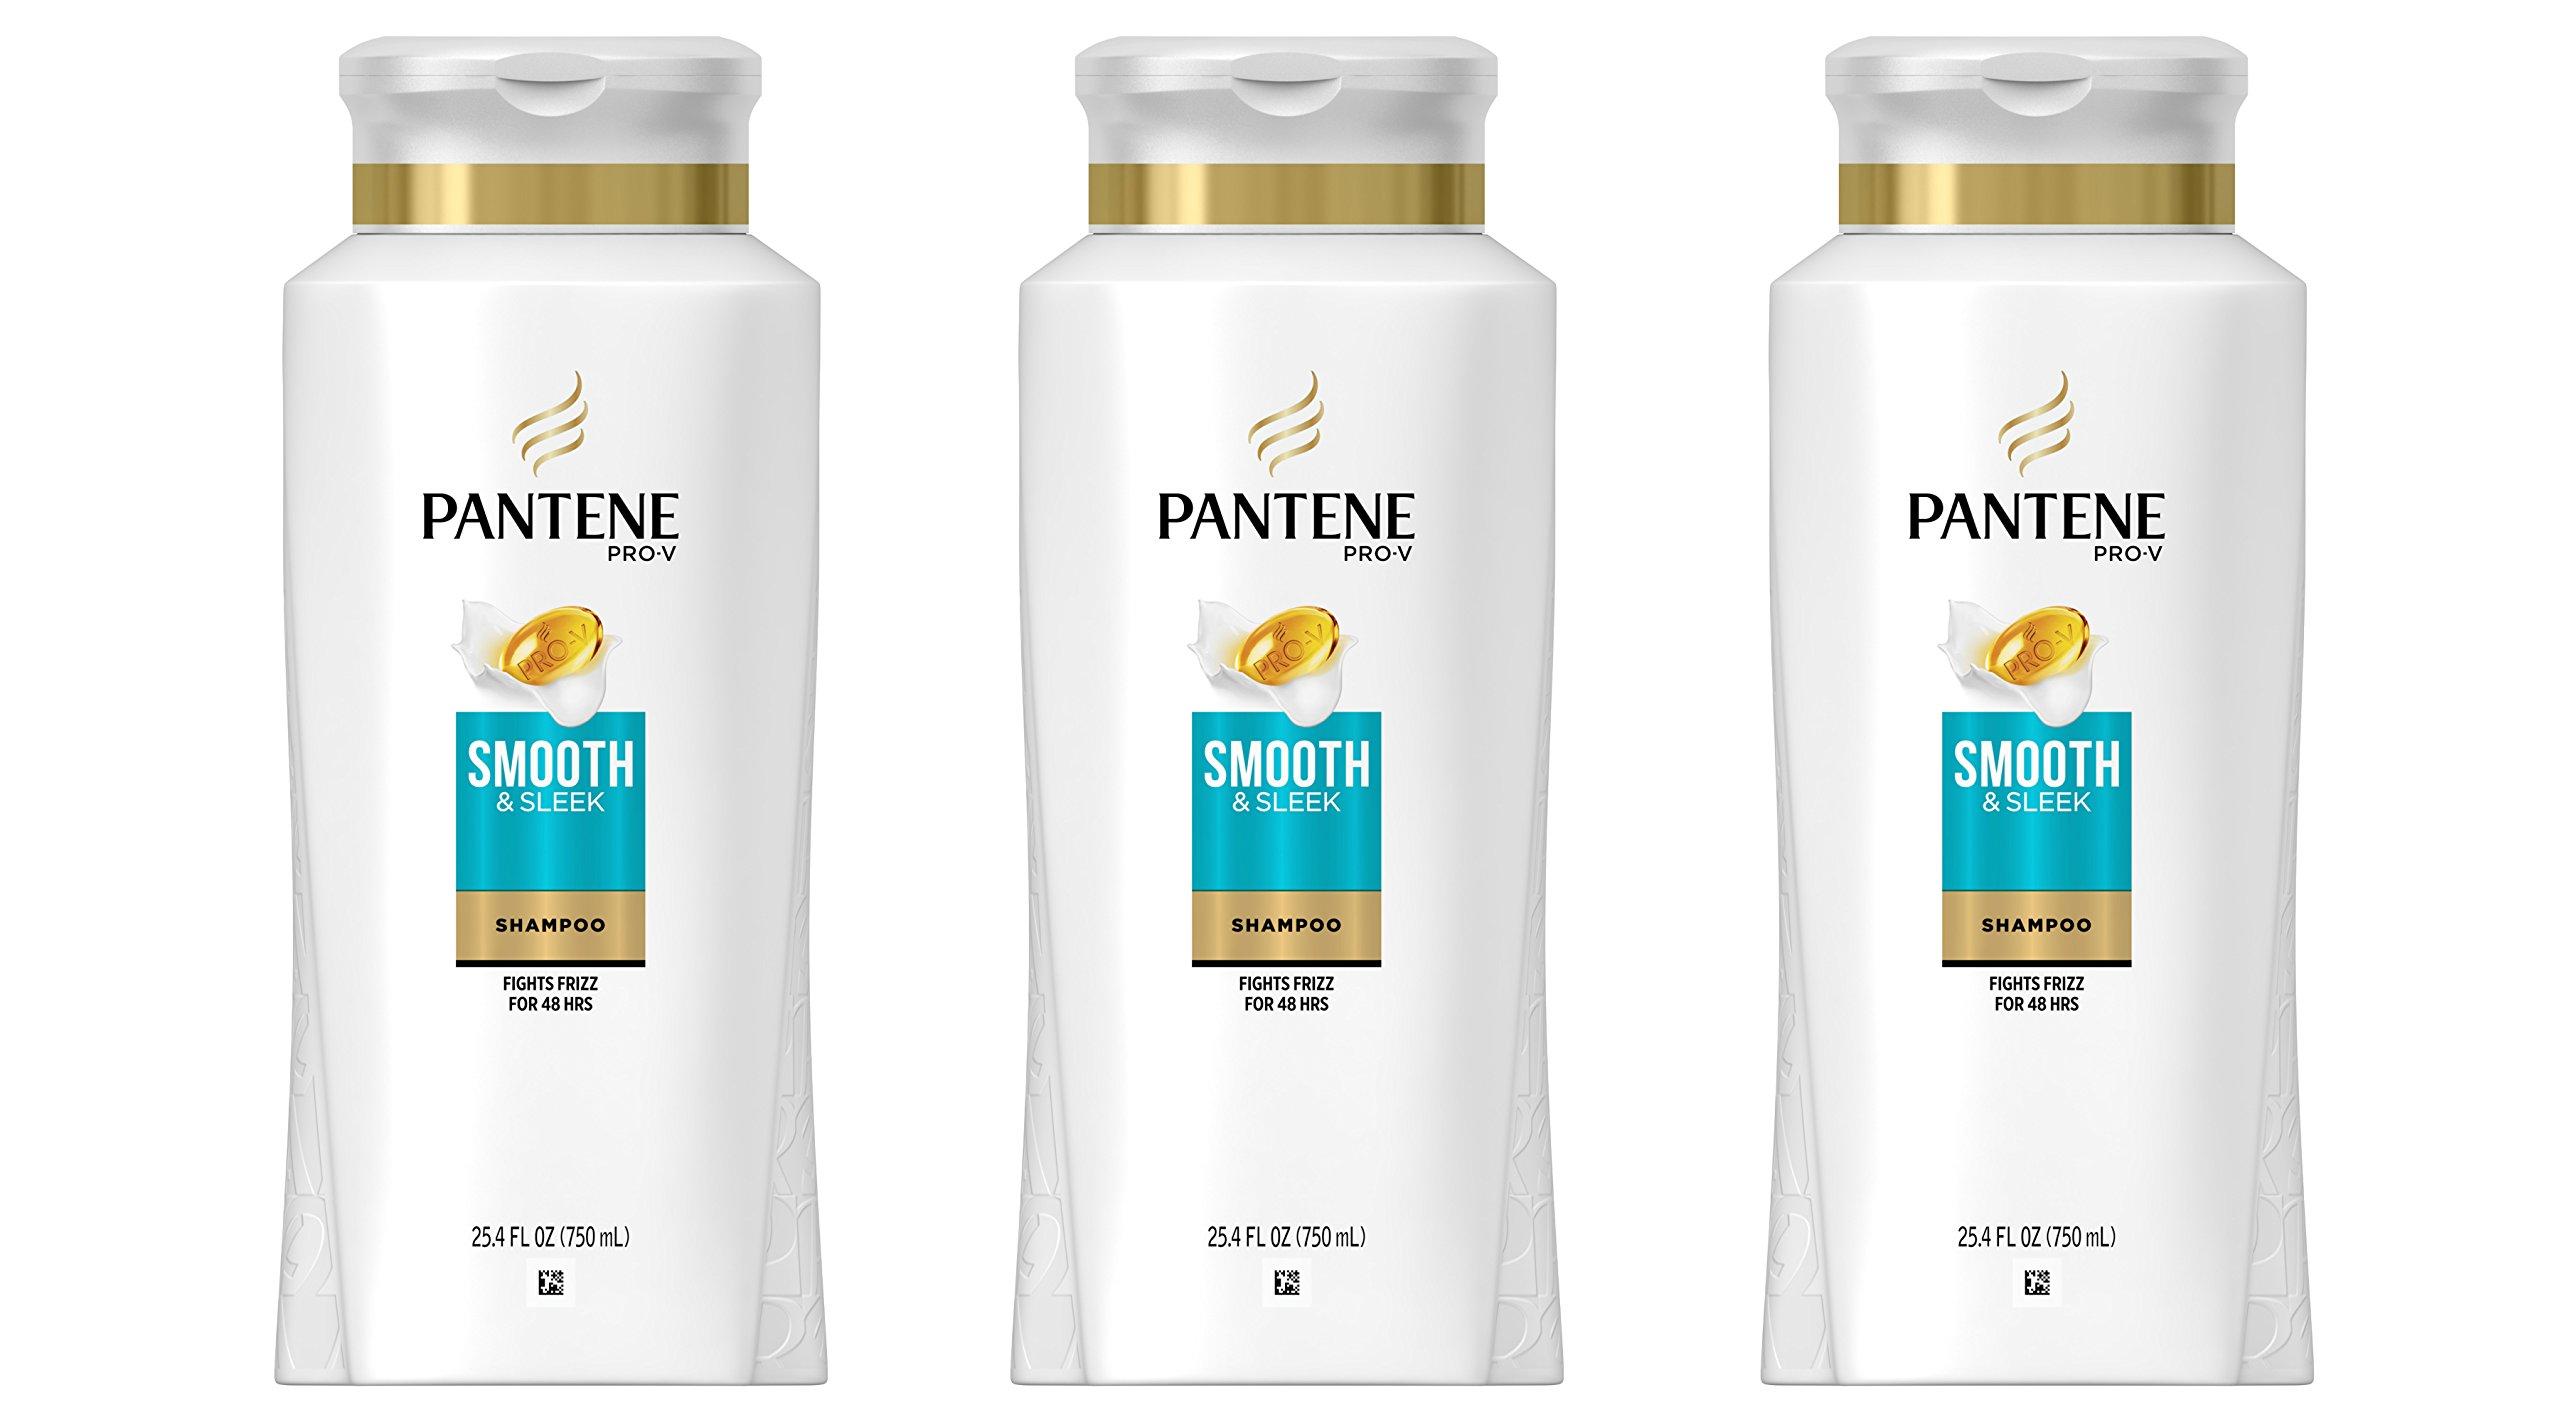 Pantene Pro-V Smooth & Sleek Shampoo, 25.4 fl oz (pack of 3) (Packaging May Vary)